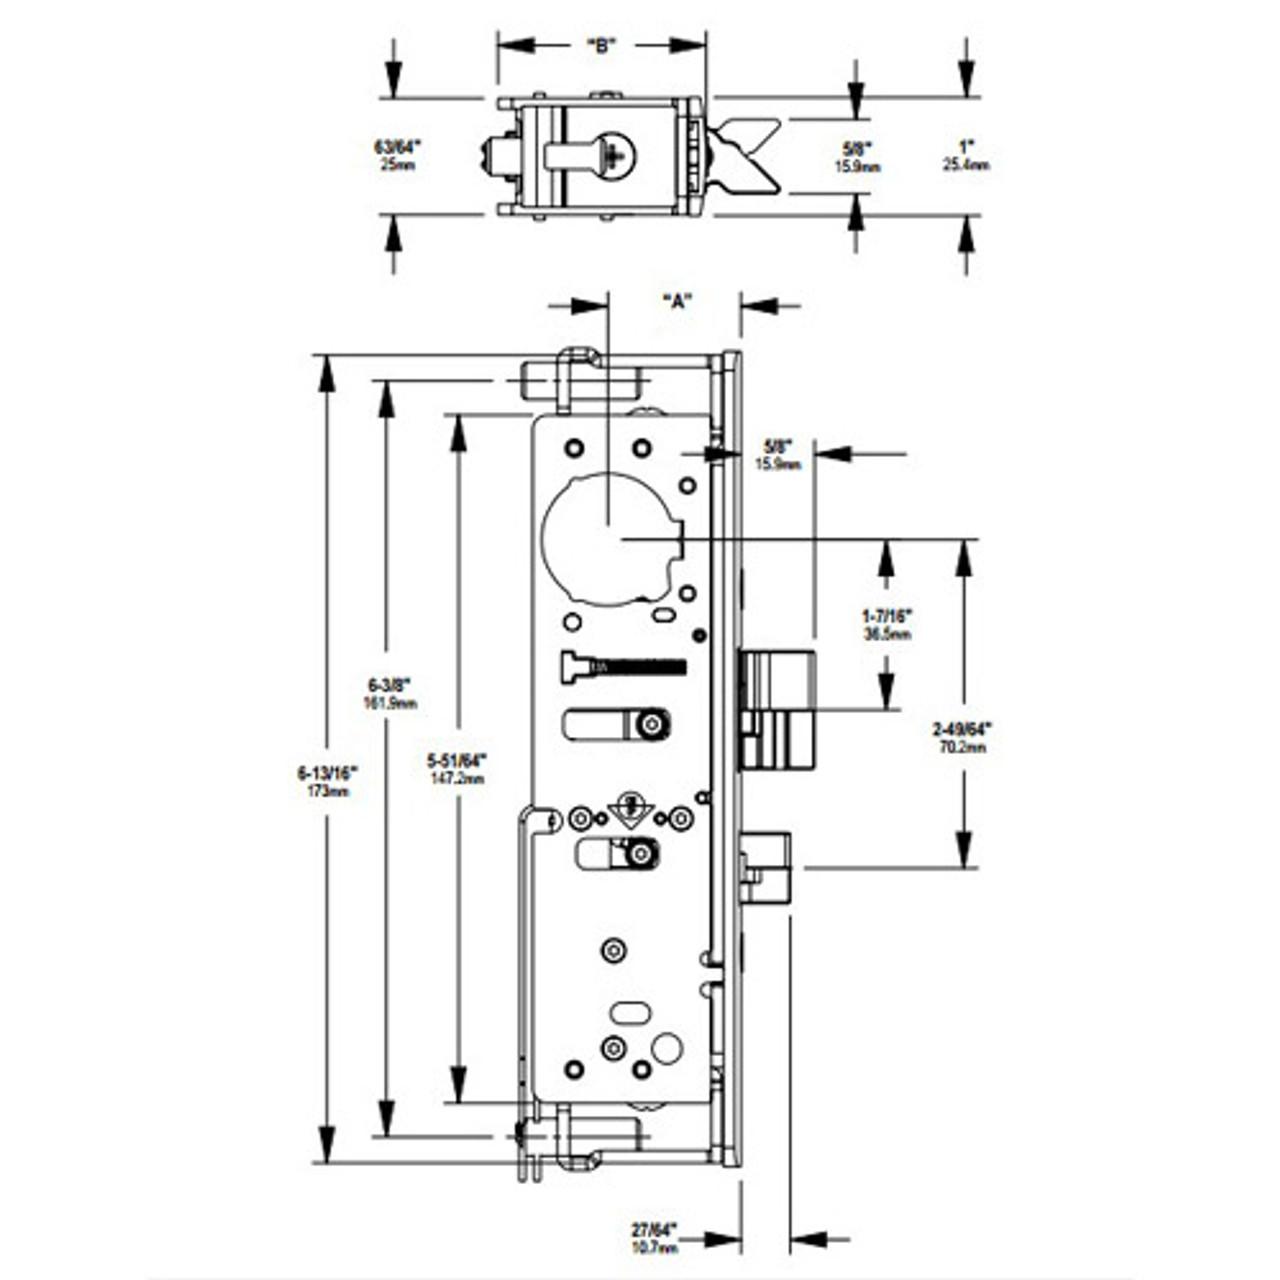 4300-20-217-628 Adams Rite Electrified Deadlatch Dimensional View